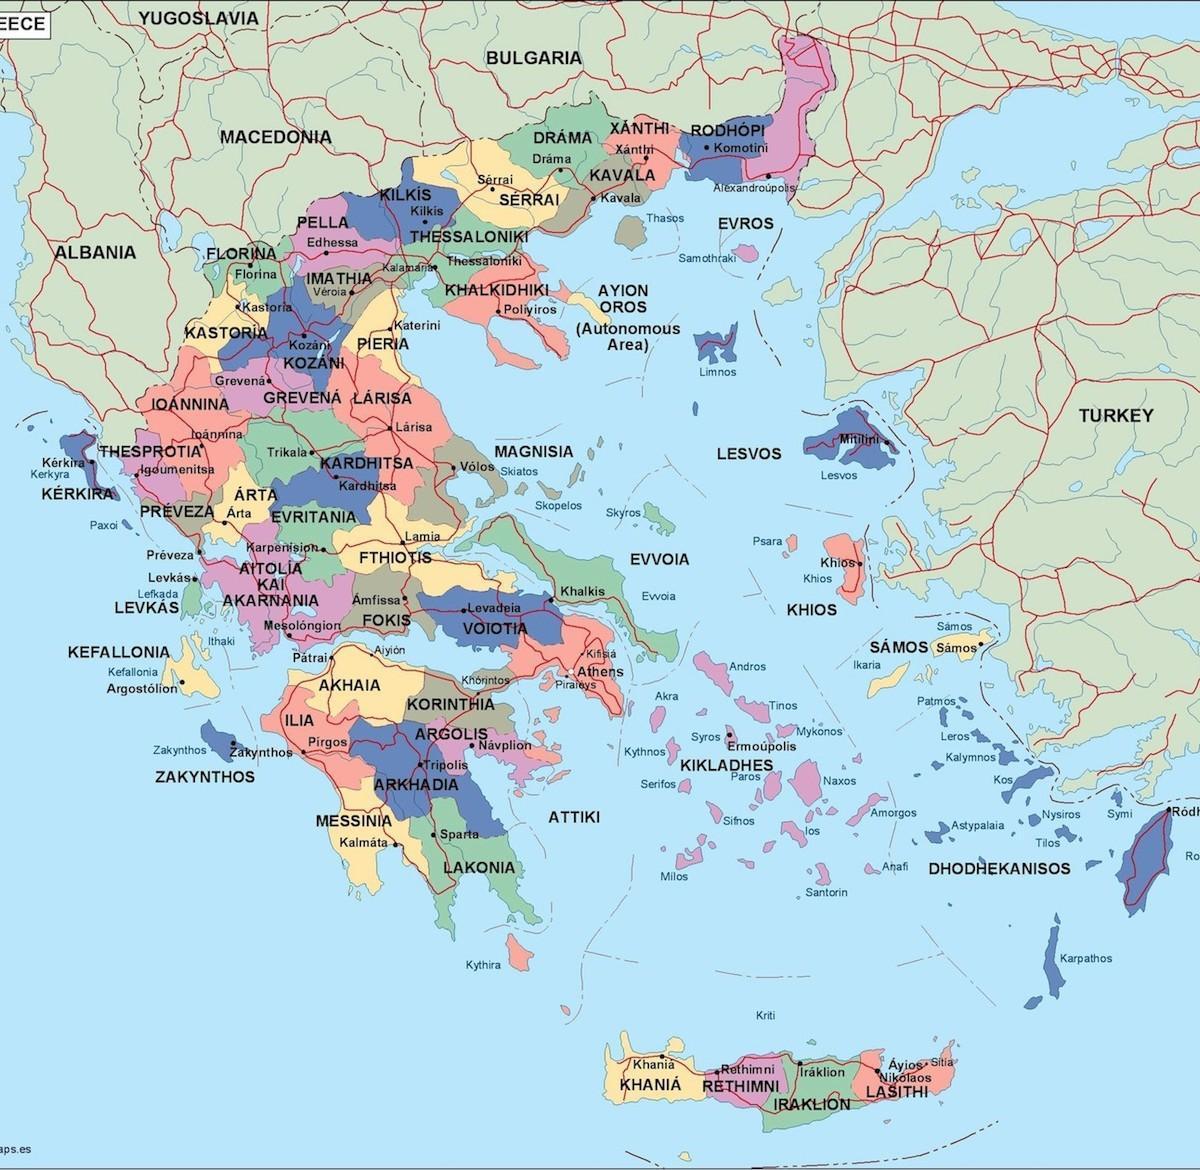 Grecia Harta Politică Harta Politică A Greciei Europa De Sud